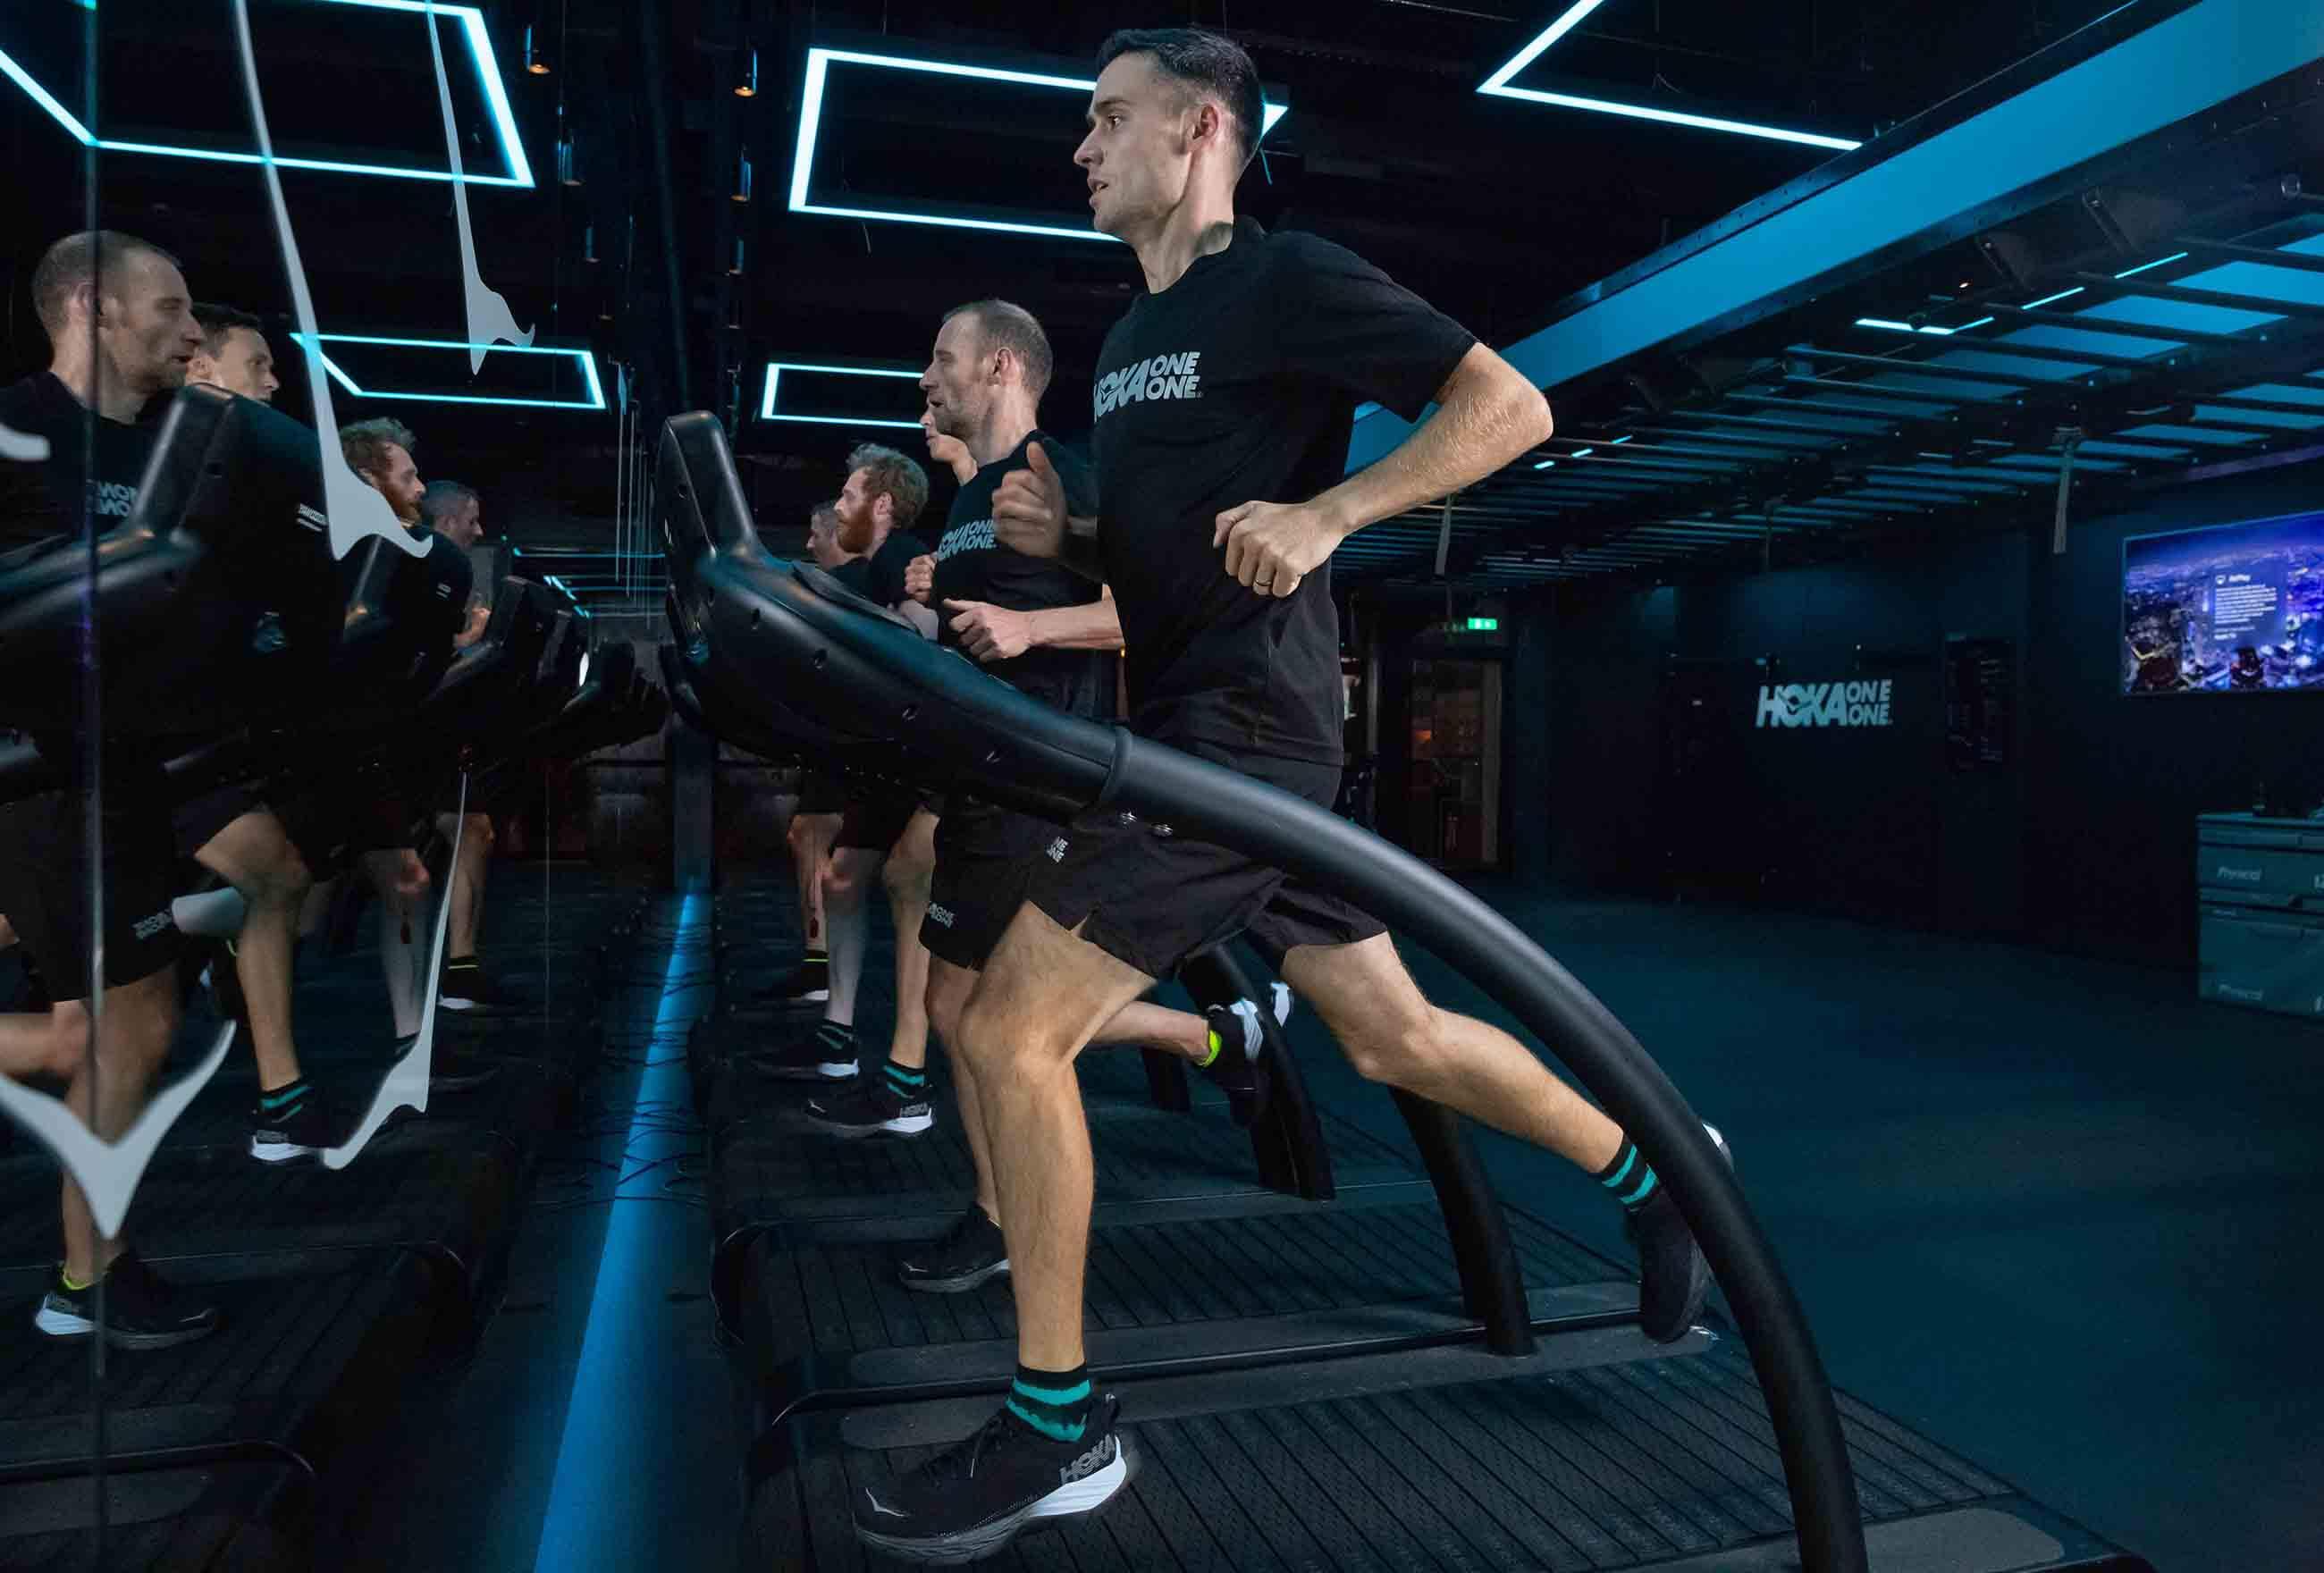 HOKA elite athlete Adam Hickey runs on the treadmill at the Fly at Night event in London